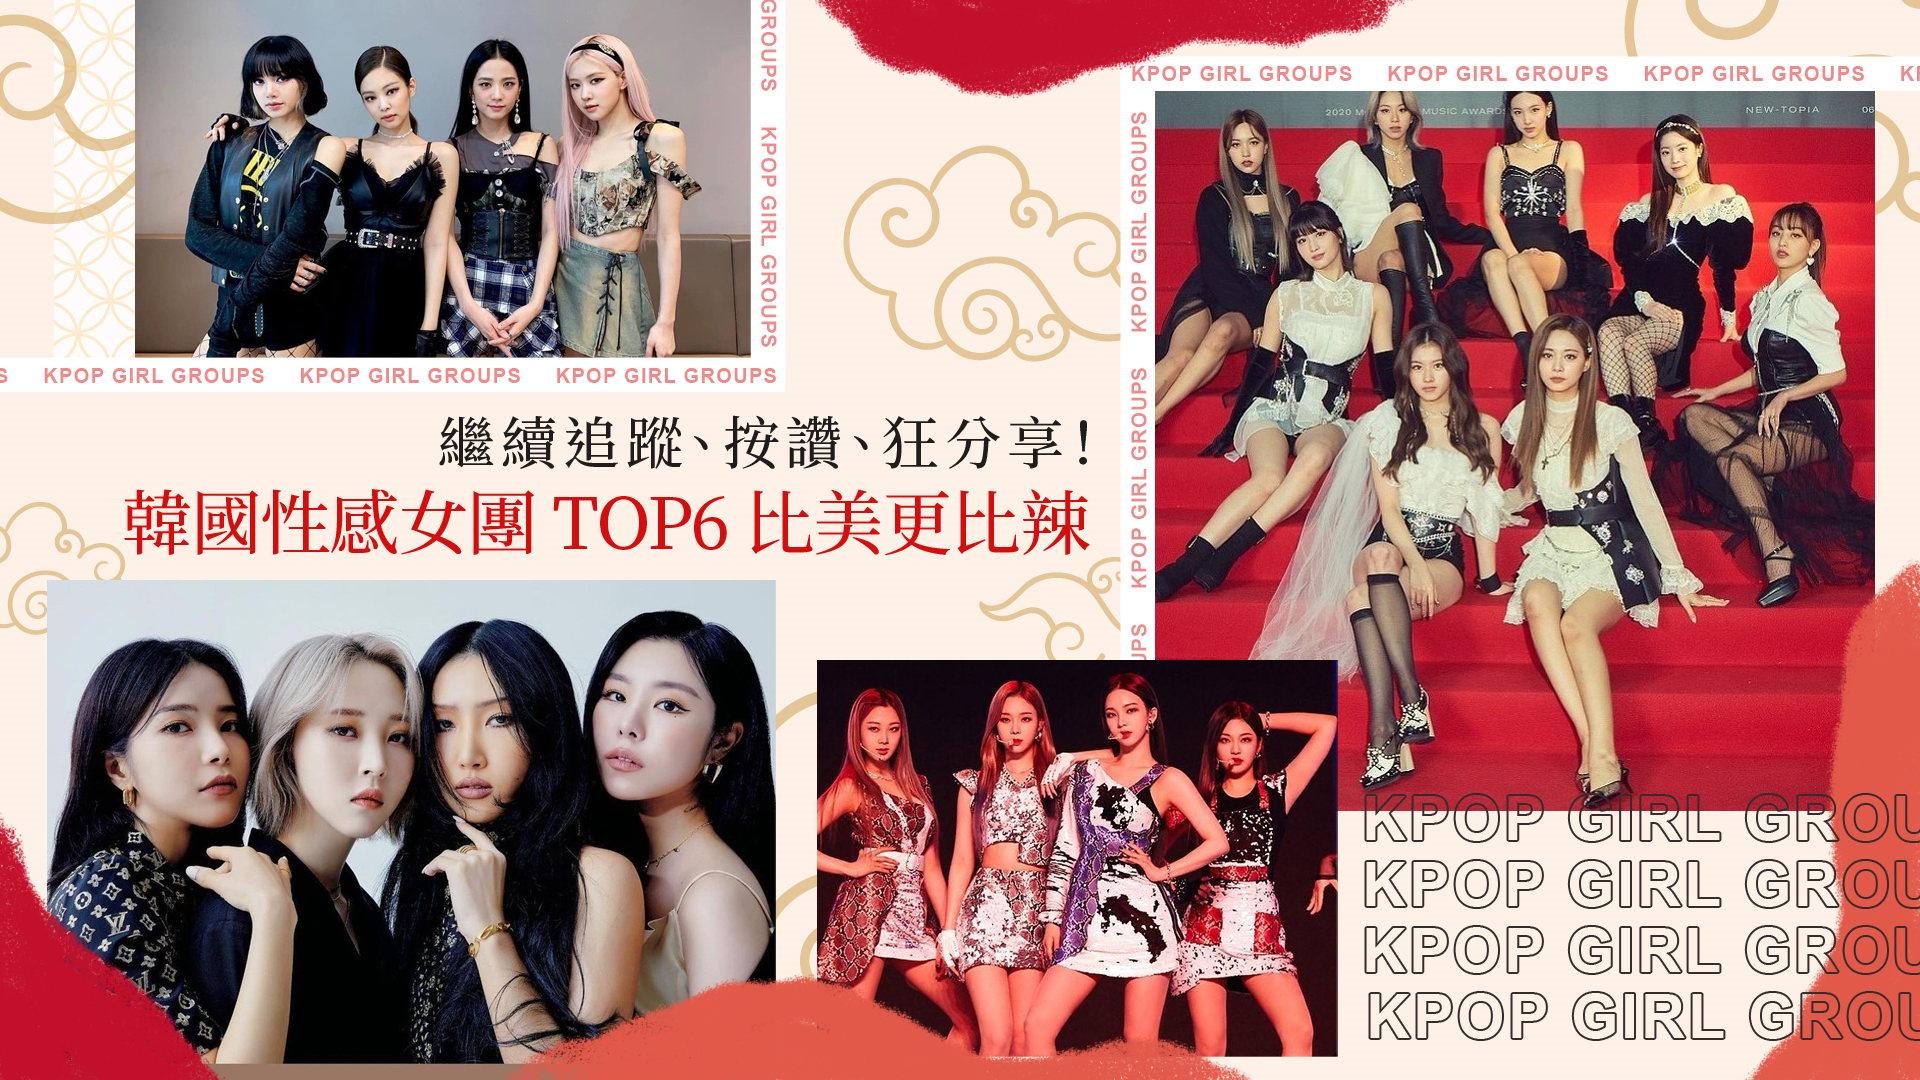 TWICE、BLACKPINK…韓國性感女團盤點!周子瑜、Lisa 就是辣眼